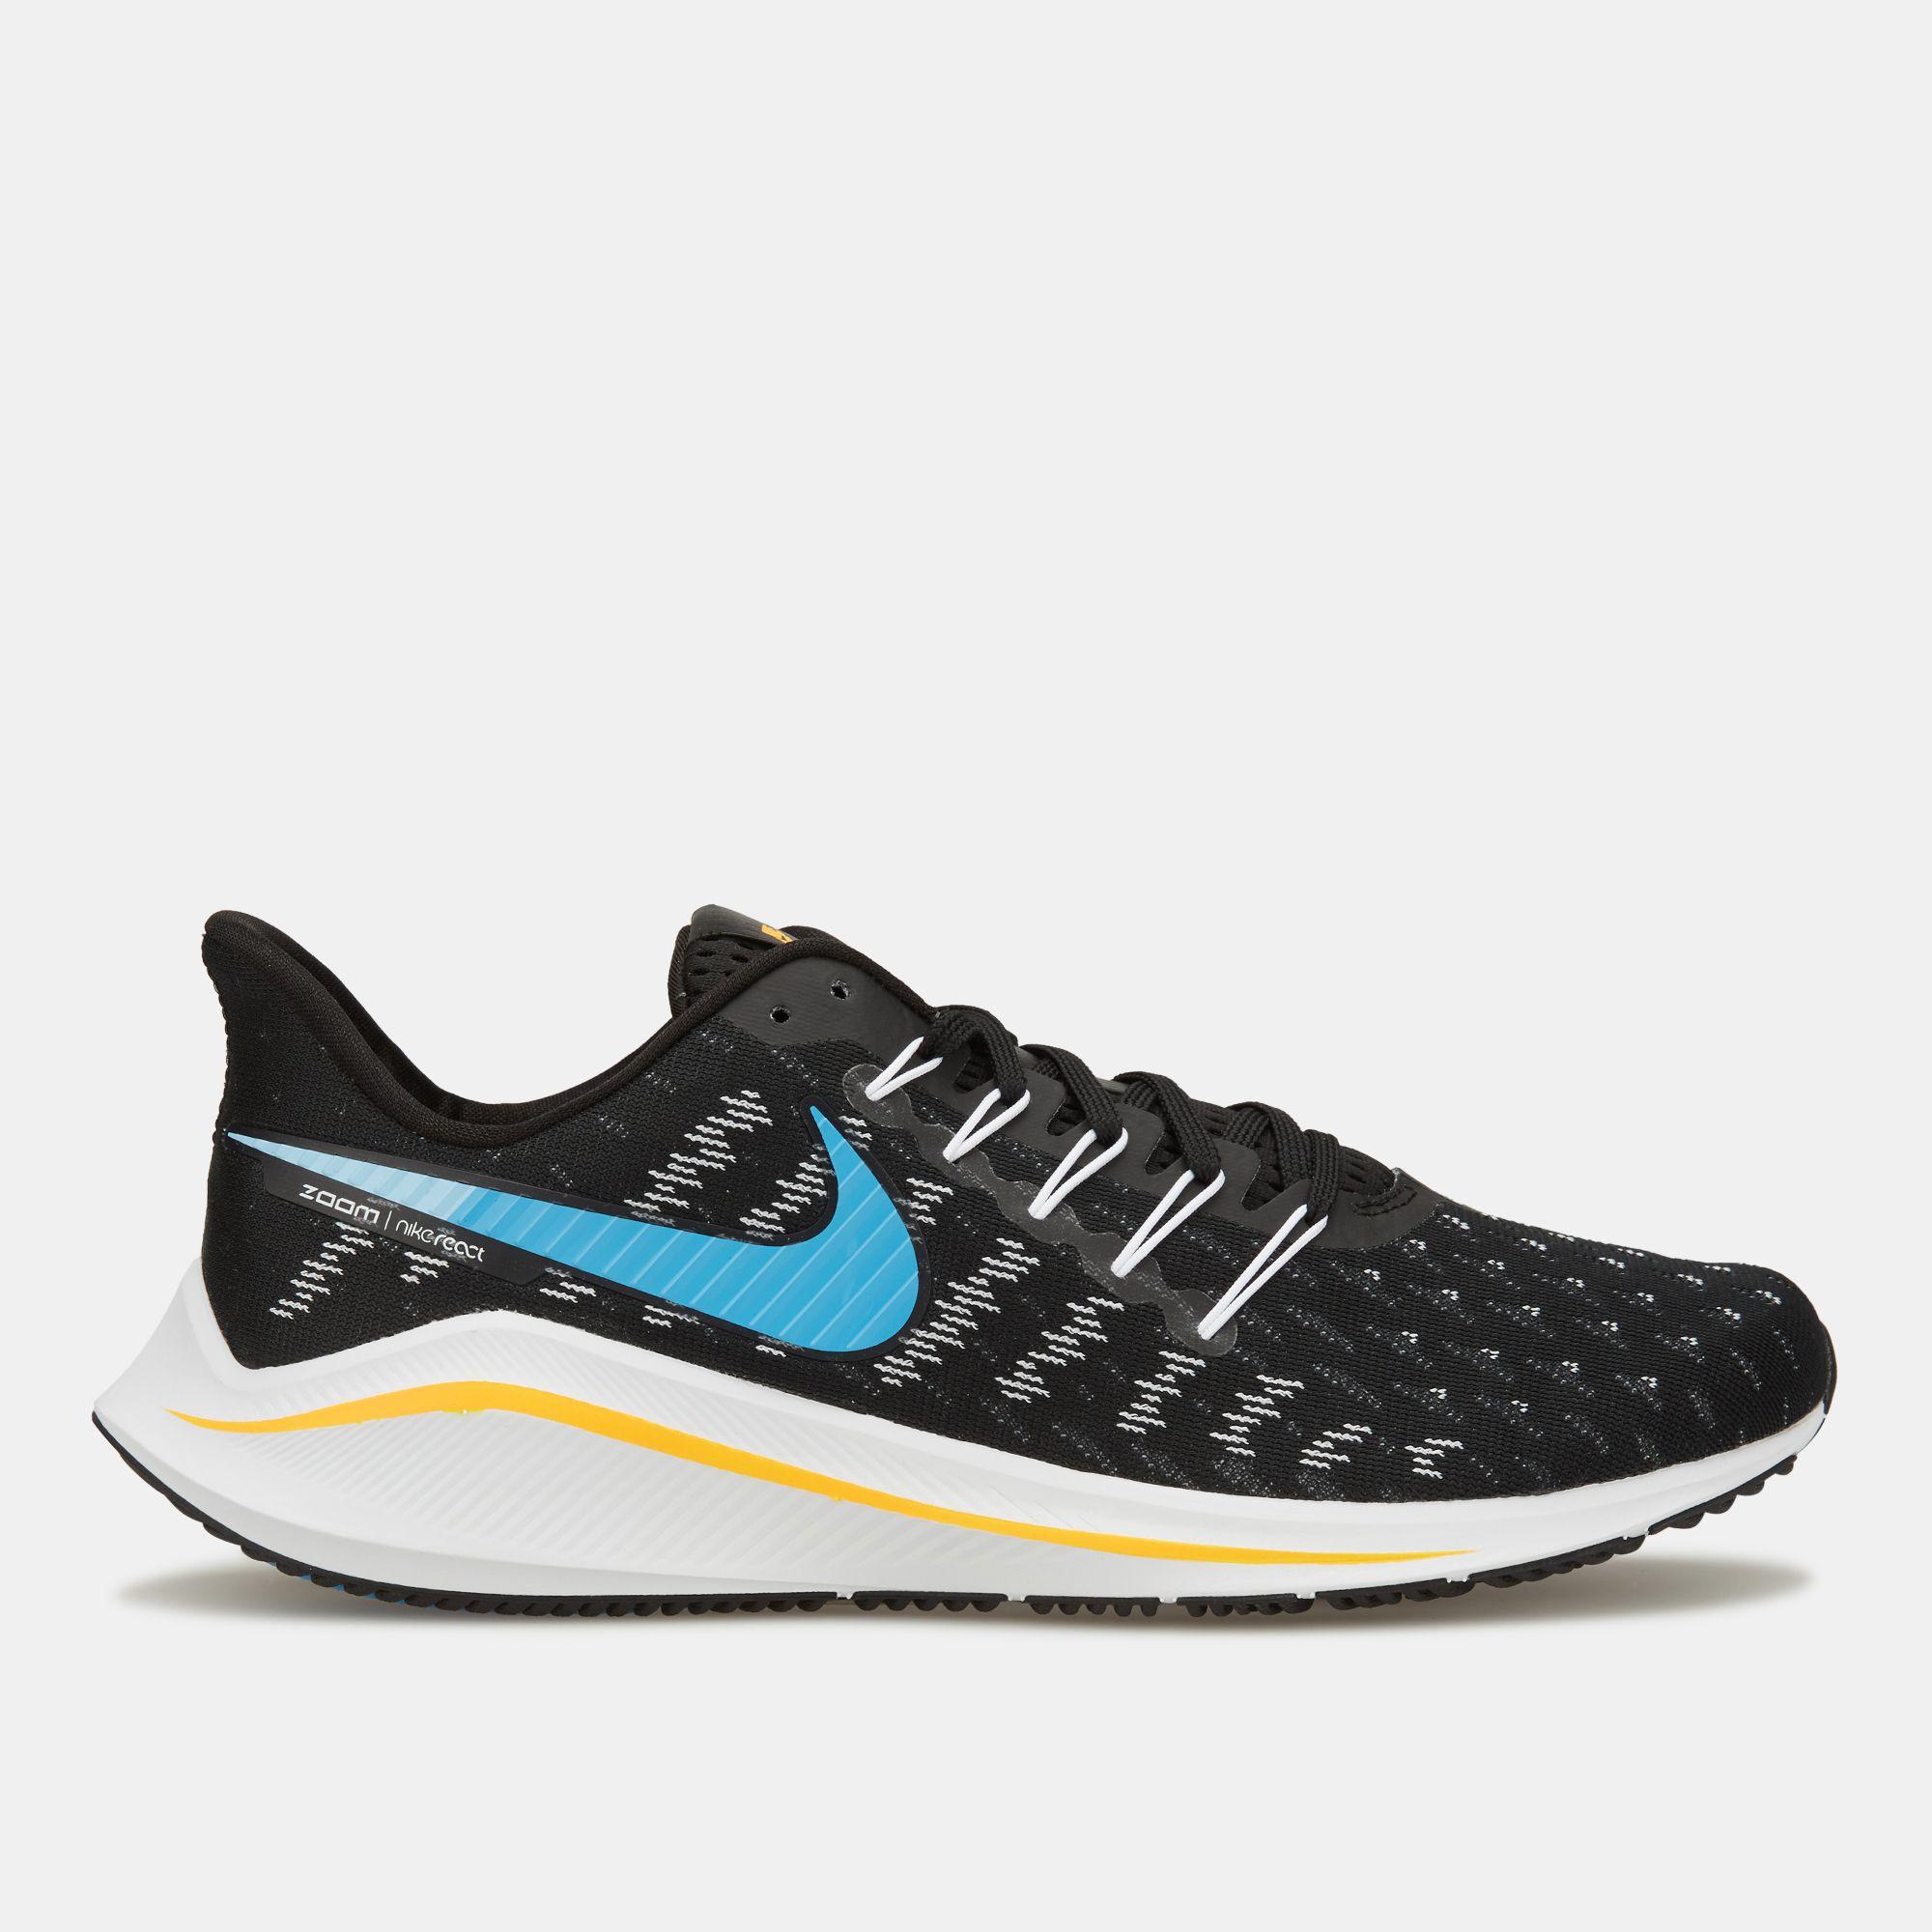 Nike Men's Air Zoom Vomero 14 Shoe